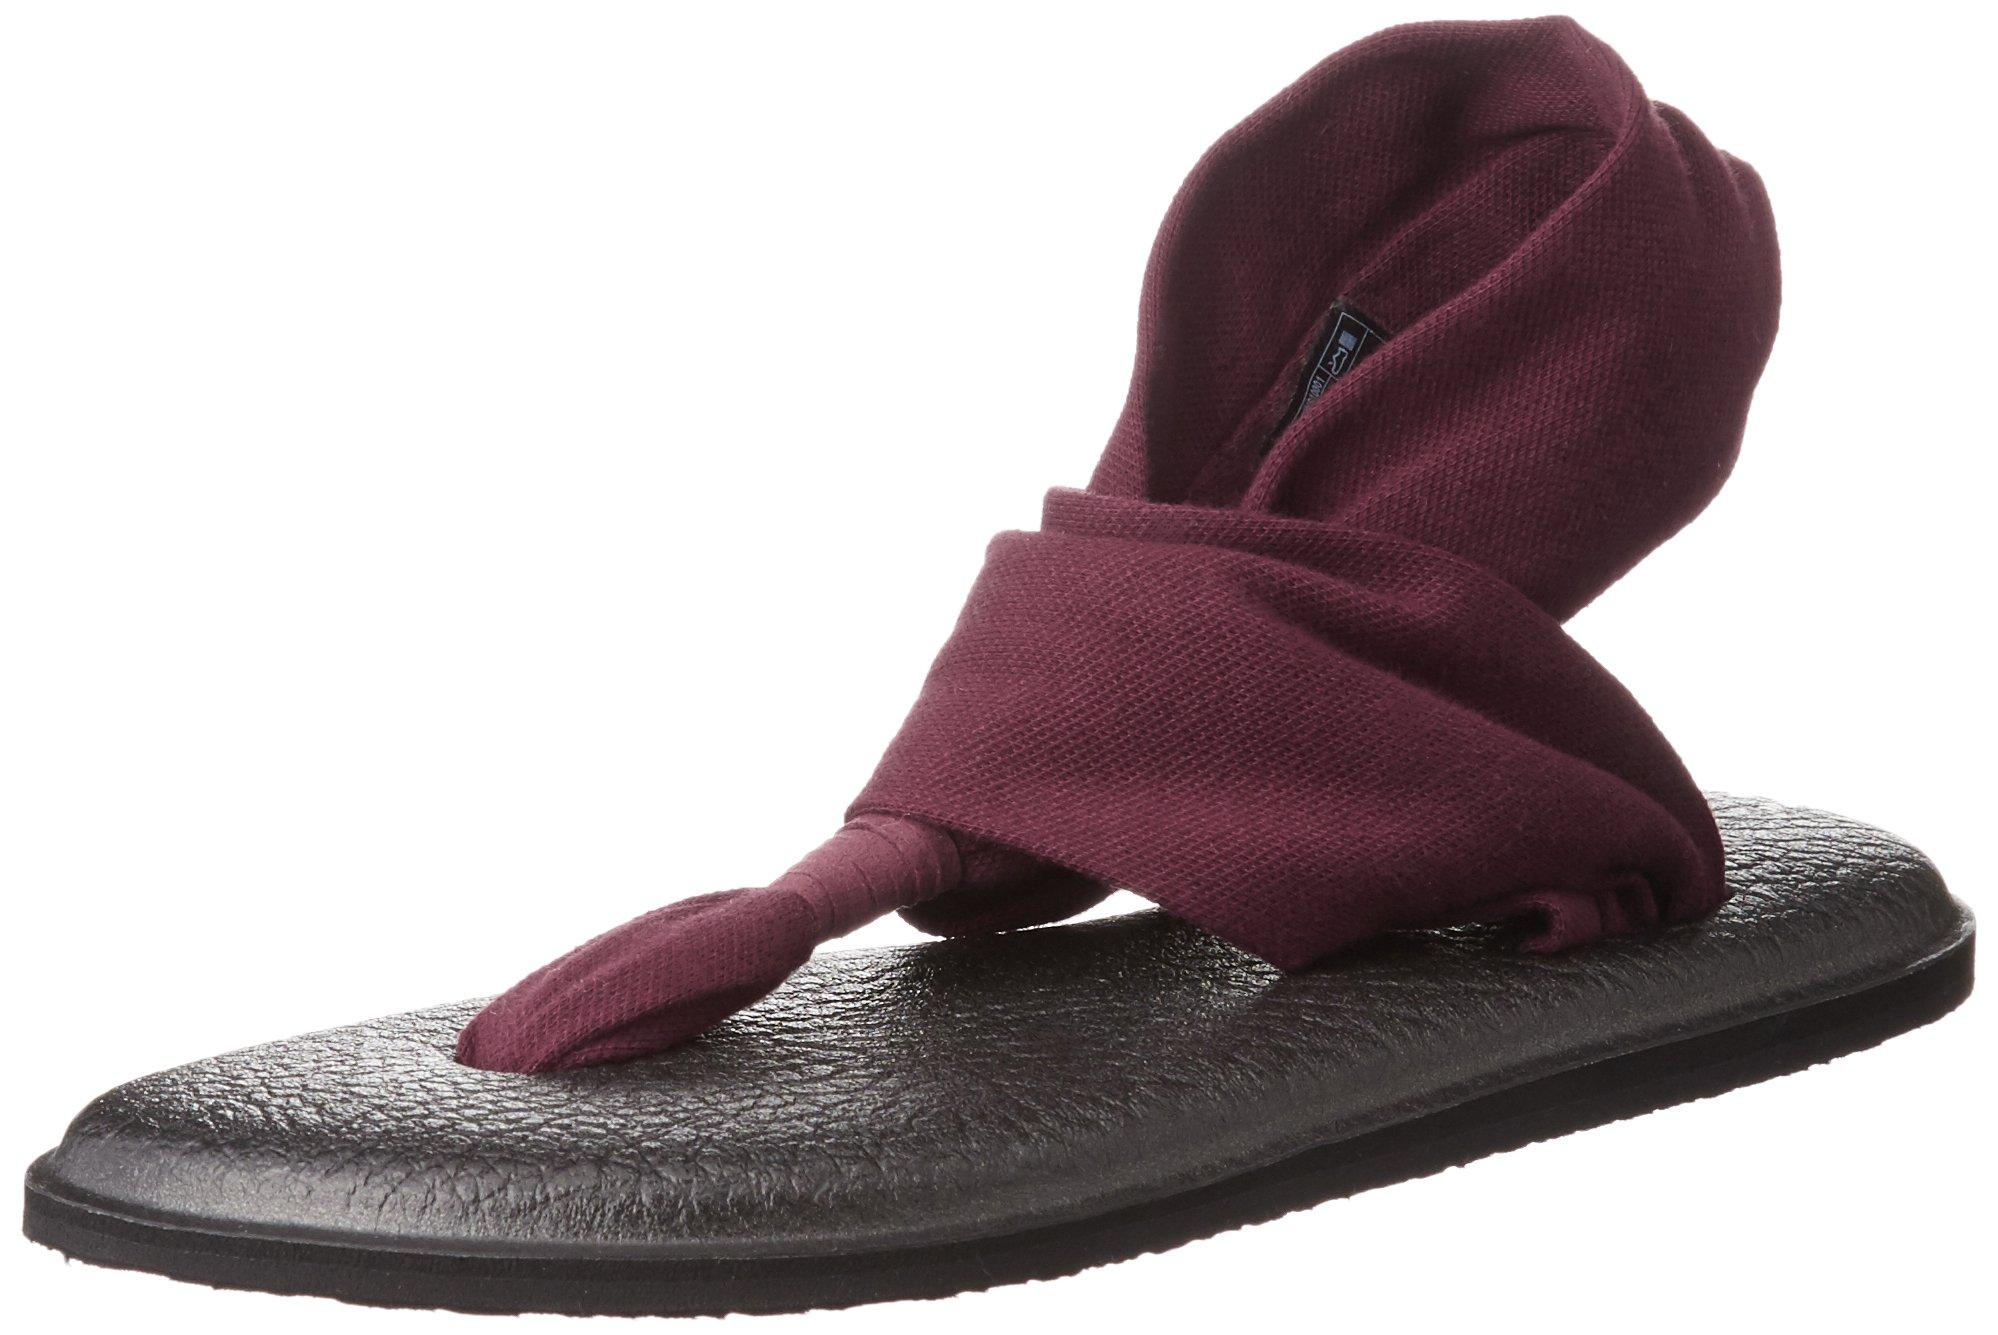 Sanuk Women's Yoga Sling 2 Flip Flop, Burgundy, 8 M US